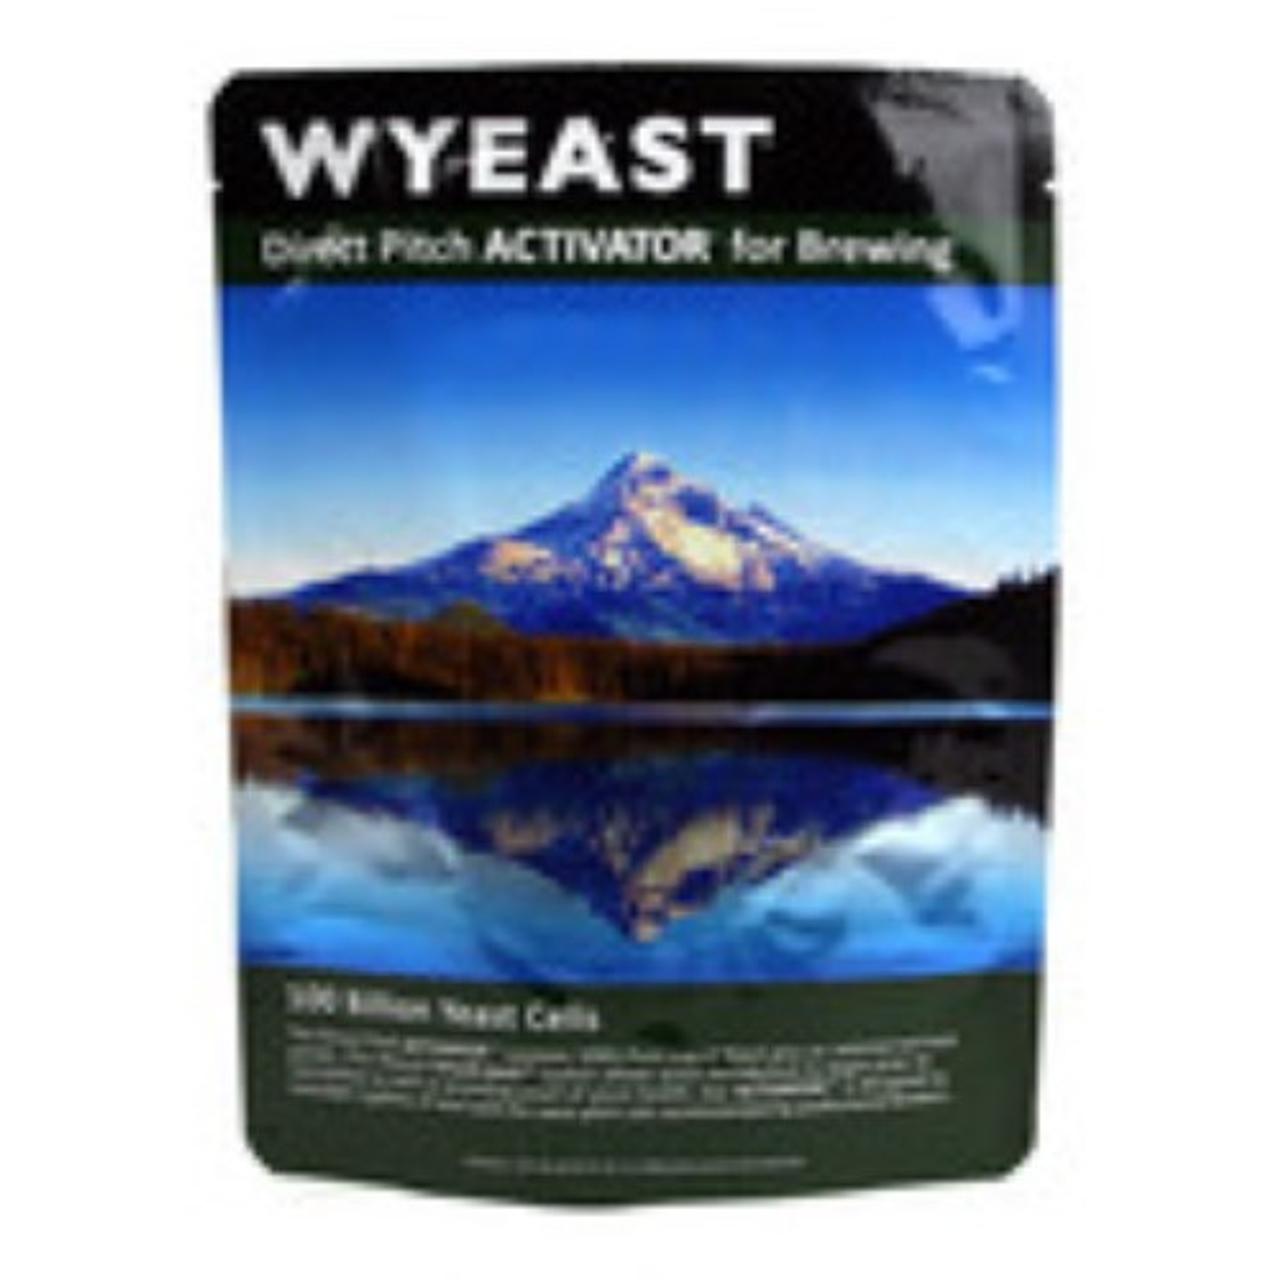 Wyeast Yeast